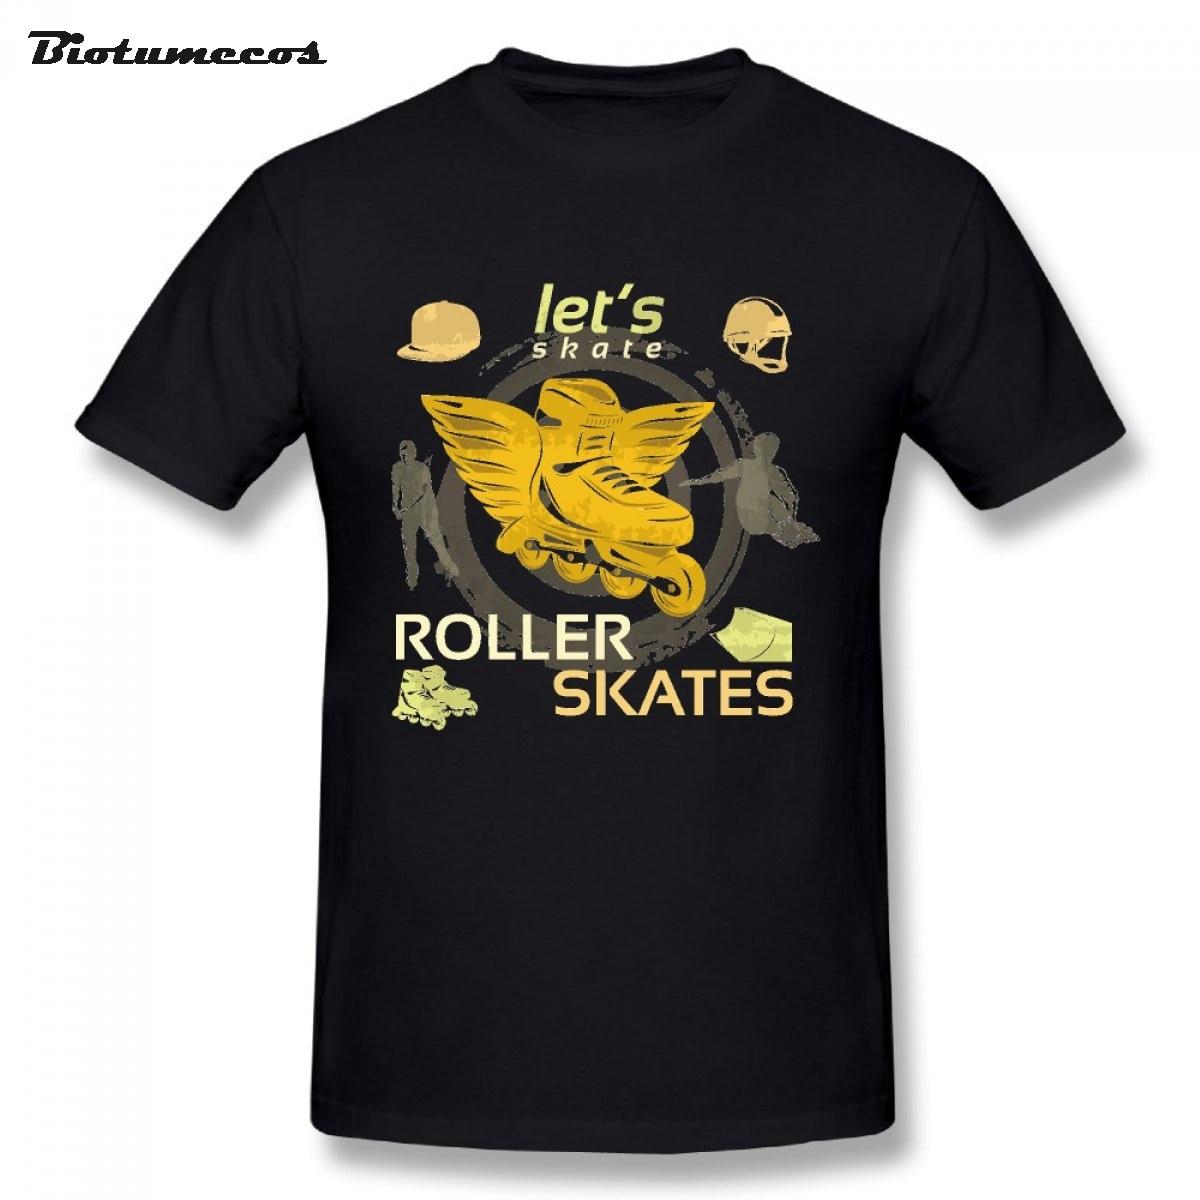 Roller skates for plus size - Plus Size Men T Shirt Let S Roller Skates Short Sleeve O Neck 100 Cotton Tees Shirt Top Clothing Mty115